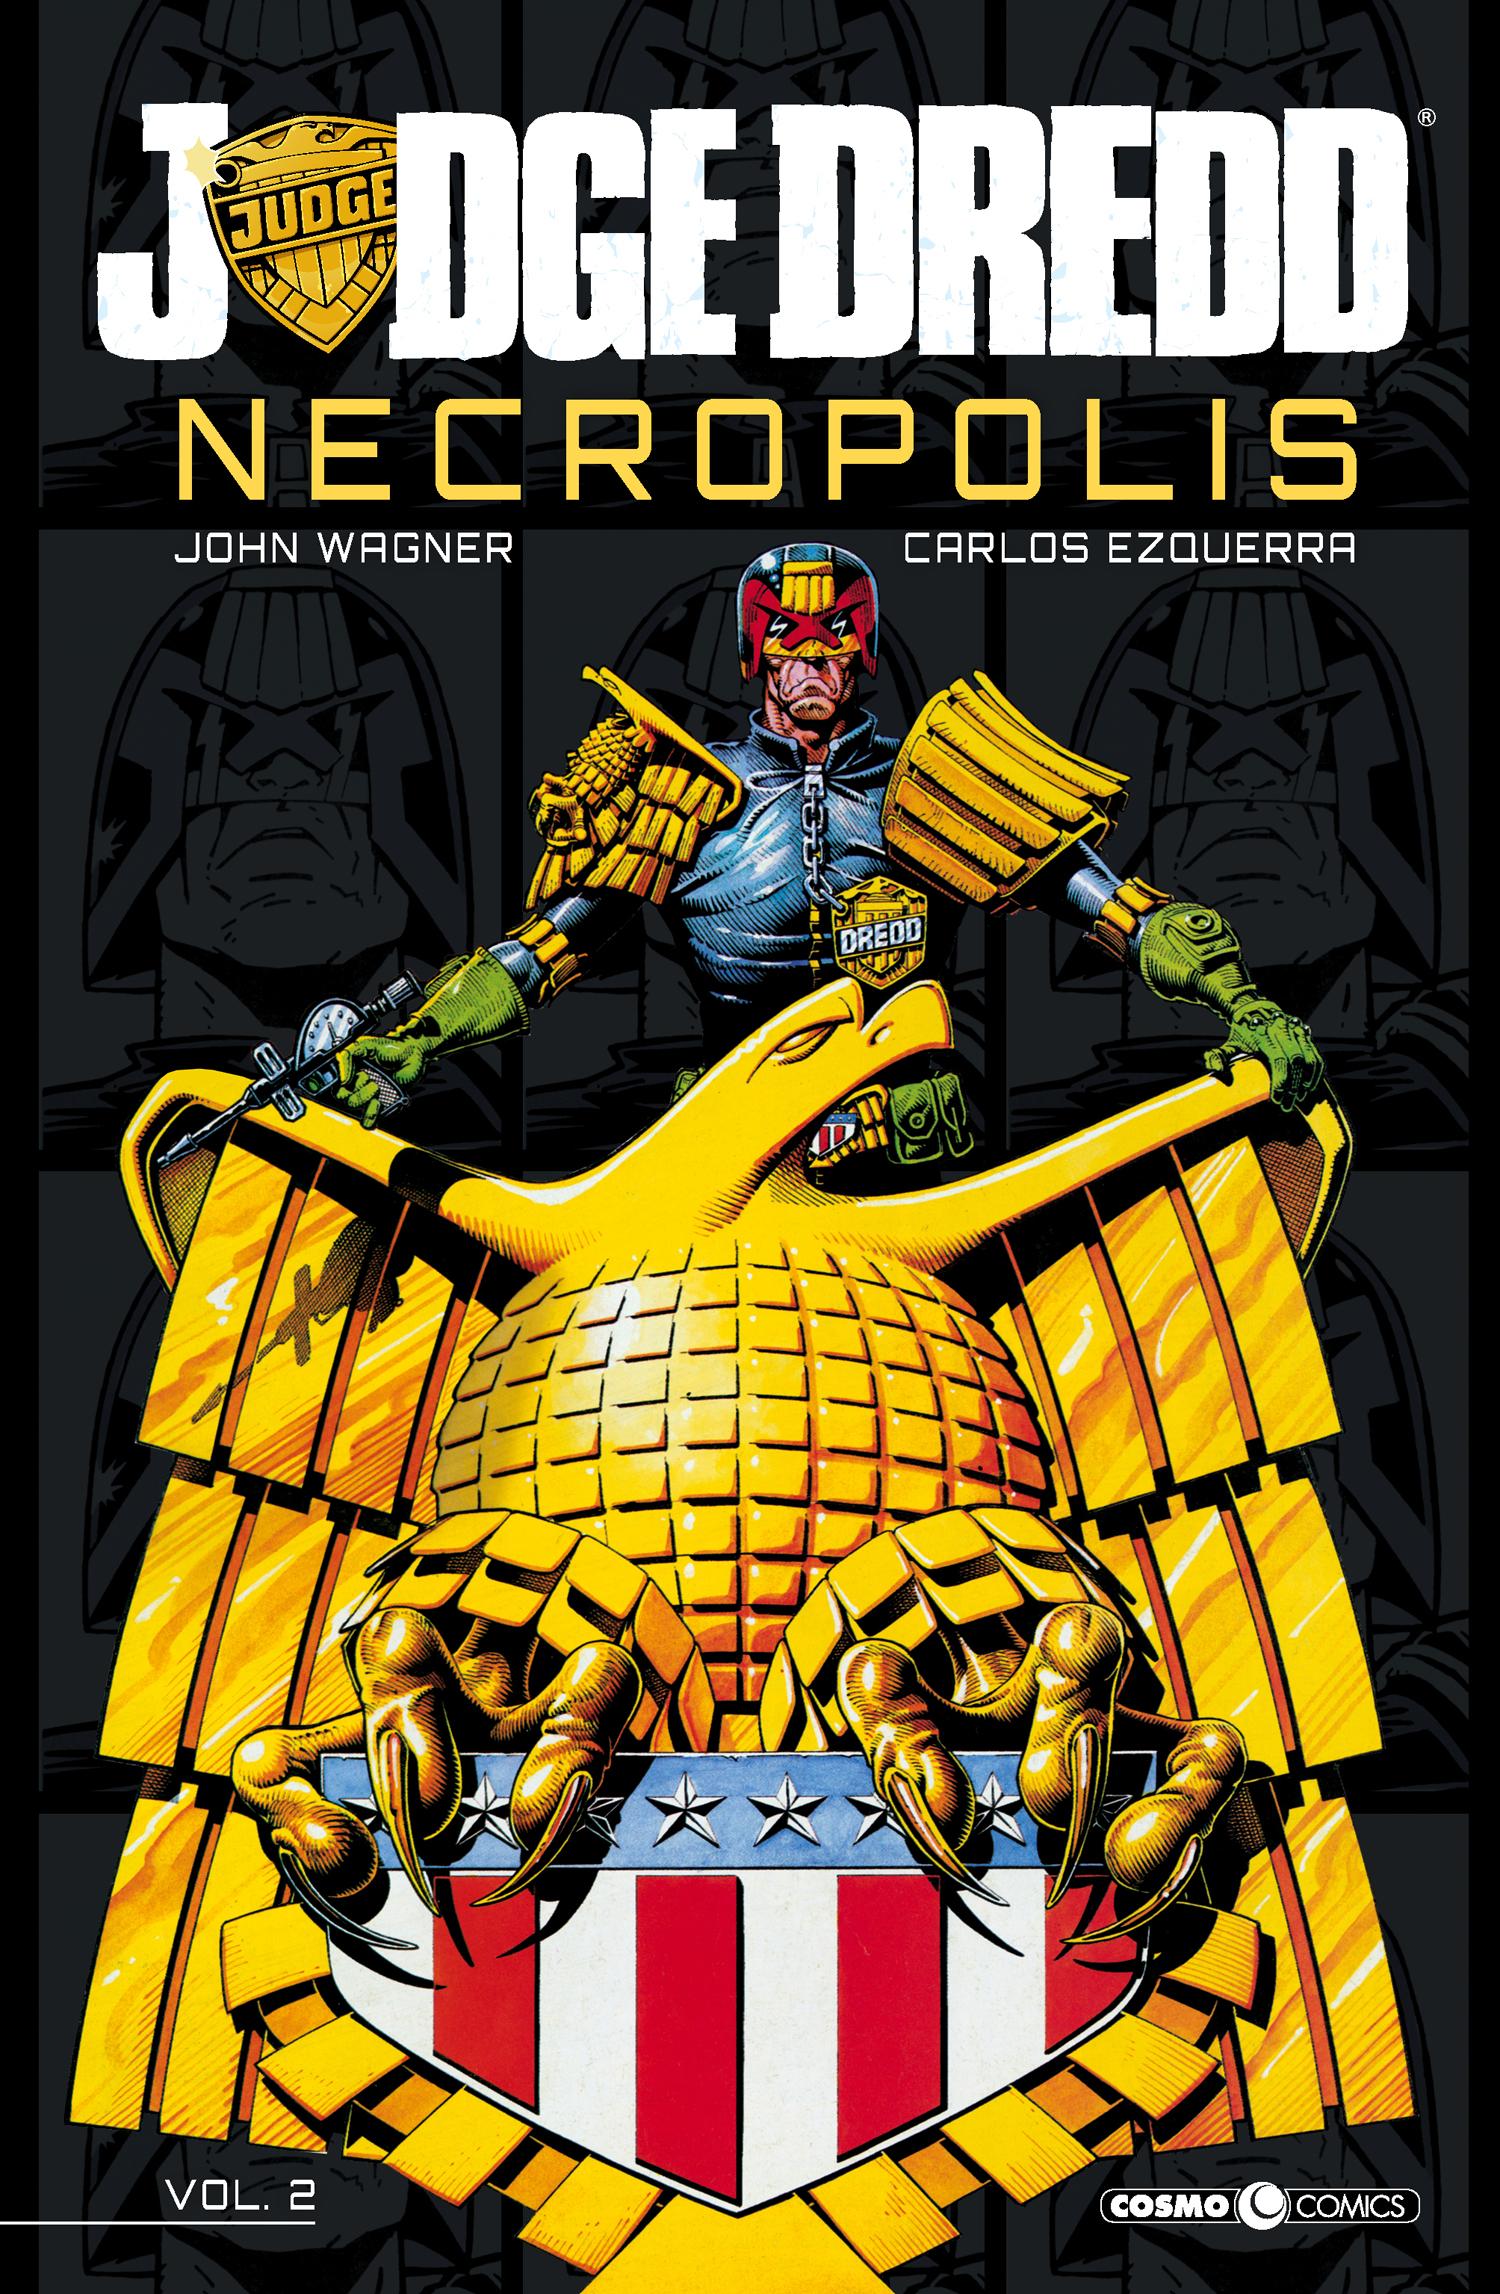 Judge-Dredd-Necropolis-2-cover.jpg